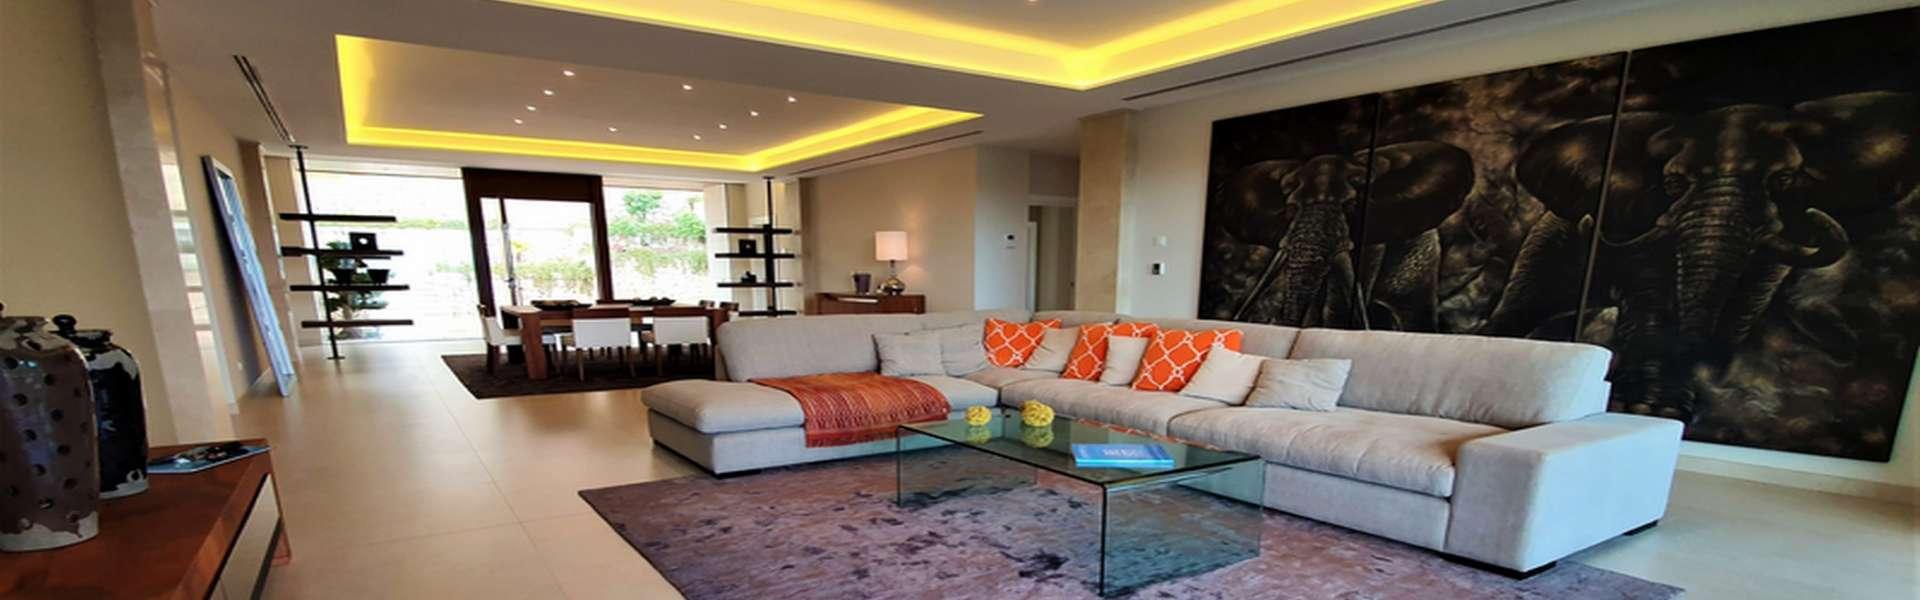 Palma/Son Vida - Moderne Villa zum Verkauf